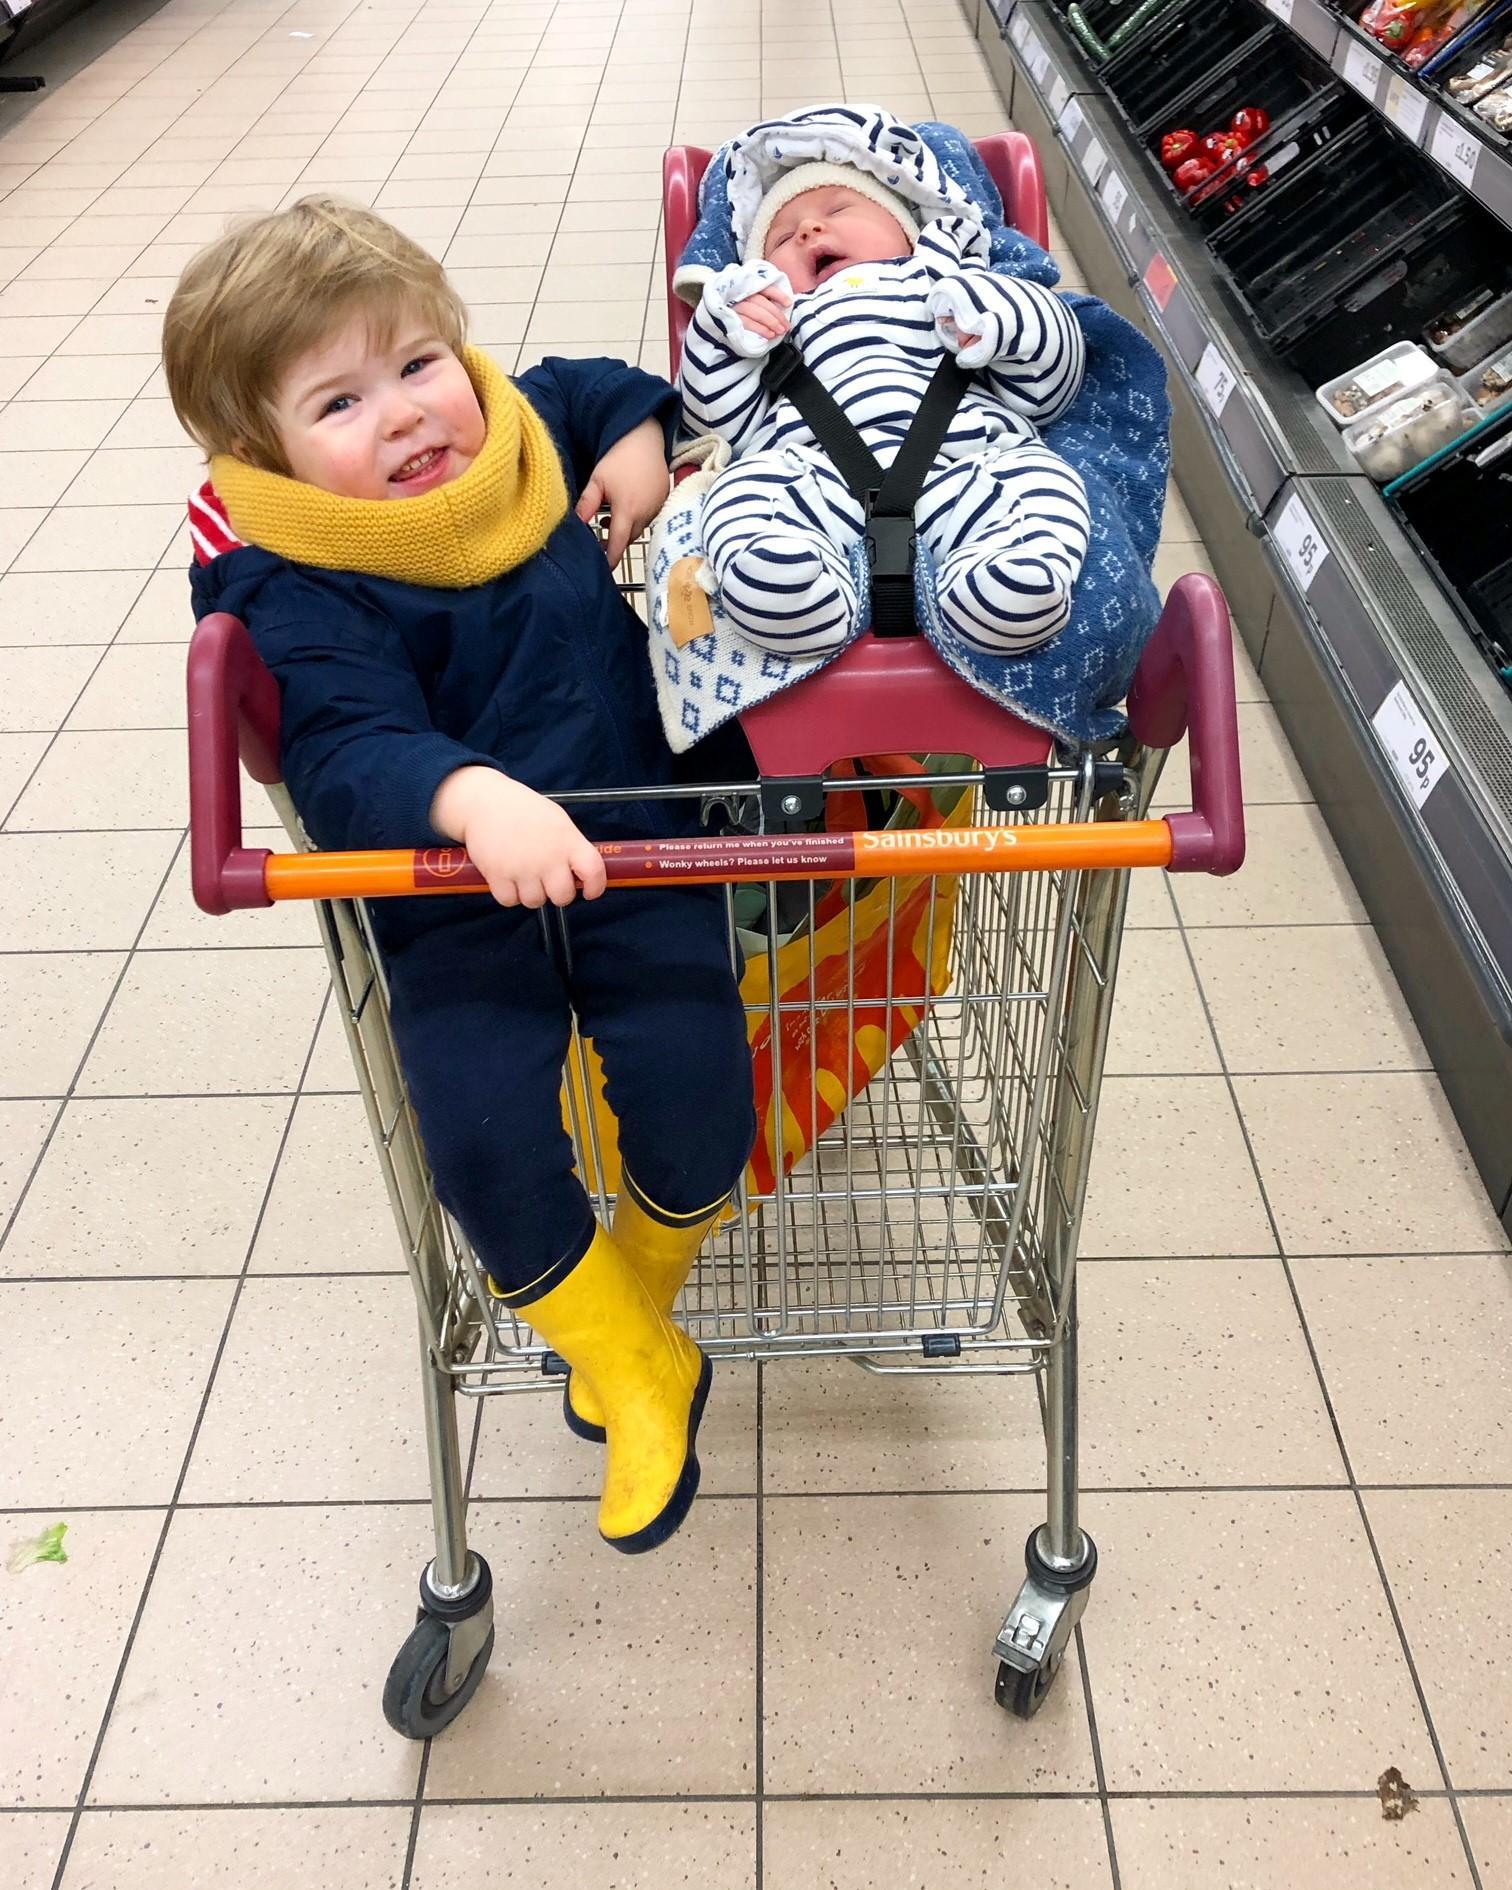 New mum diary - first supermarket trip